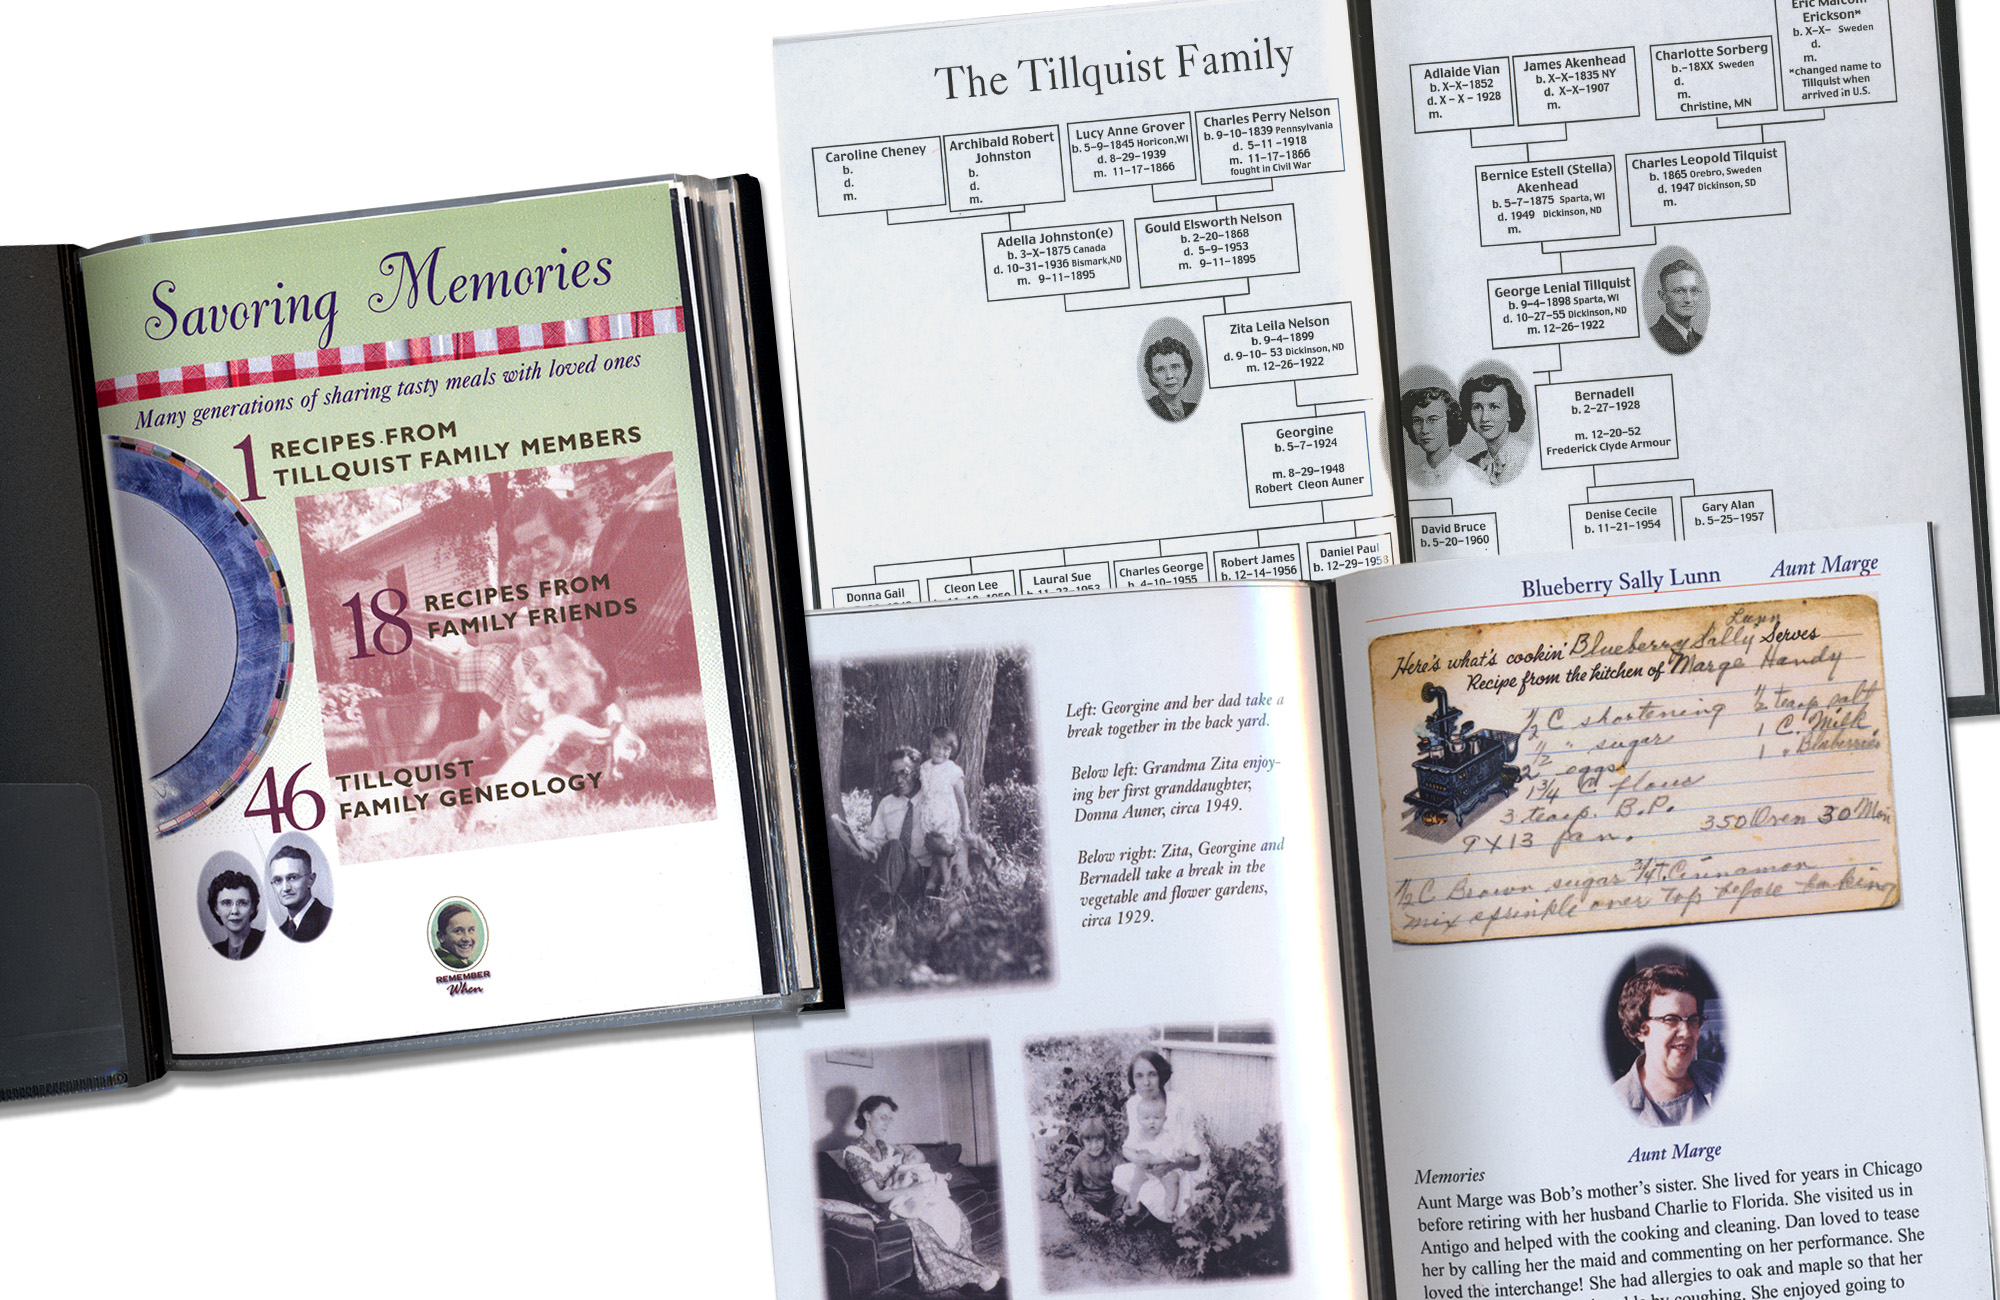 CUSTOM MEMOIR PUBLICATIONS